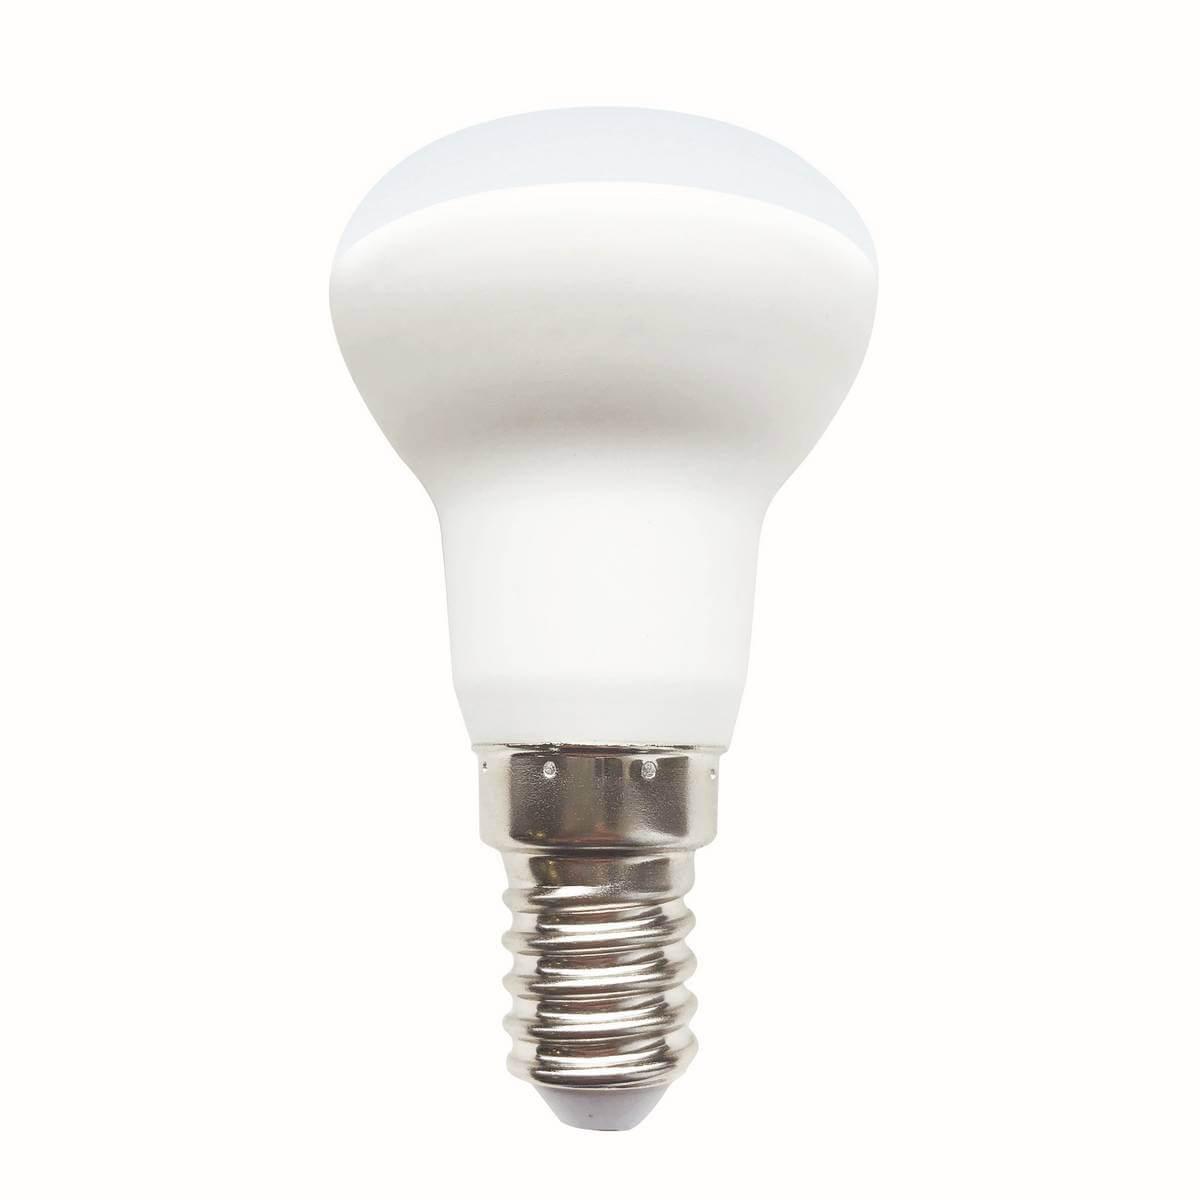 цена Лампочка Volpe LED-R39-3W/4000K/E14/FR/NR Norma онлайн в 2017 году